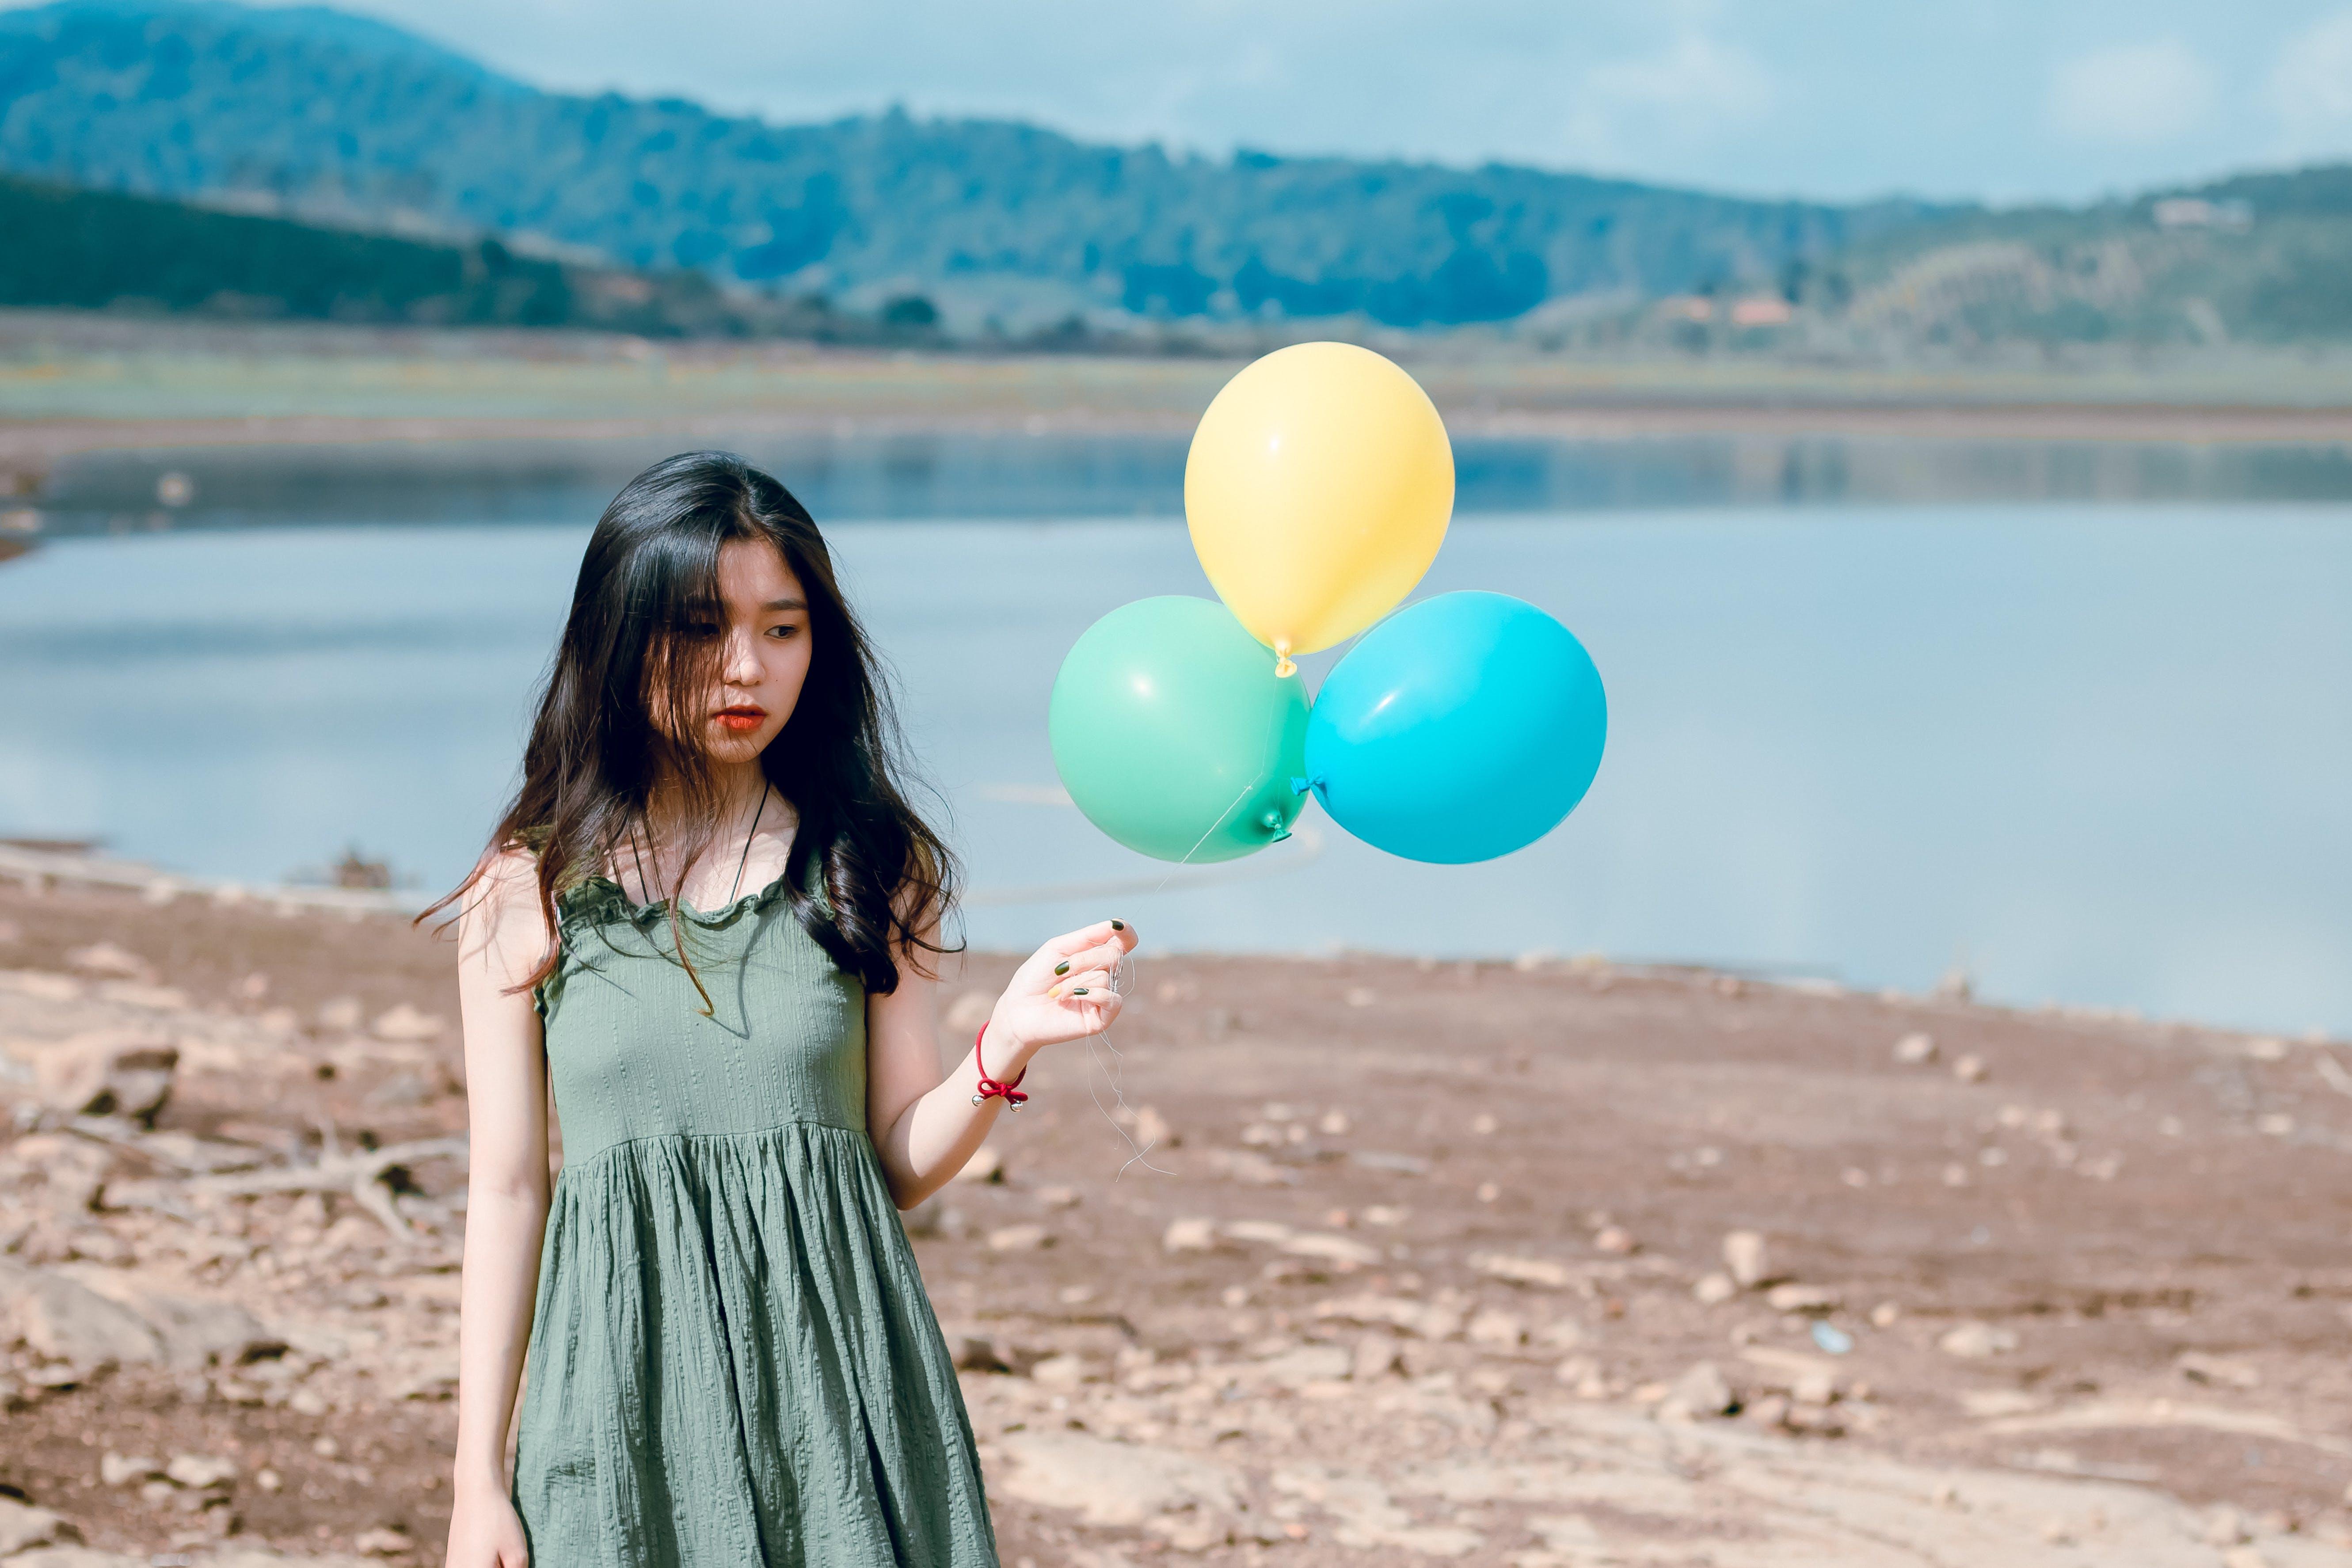 Woman in Green Sleeveless Dress Holding Three Balloons